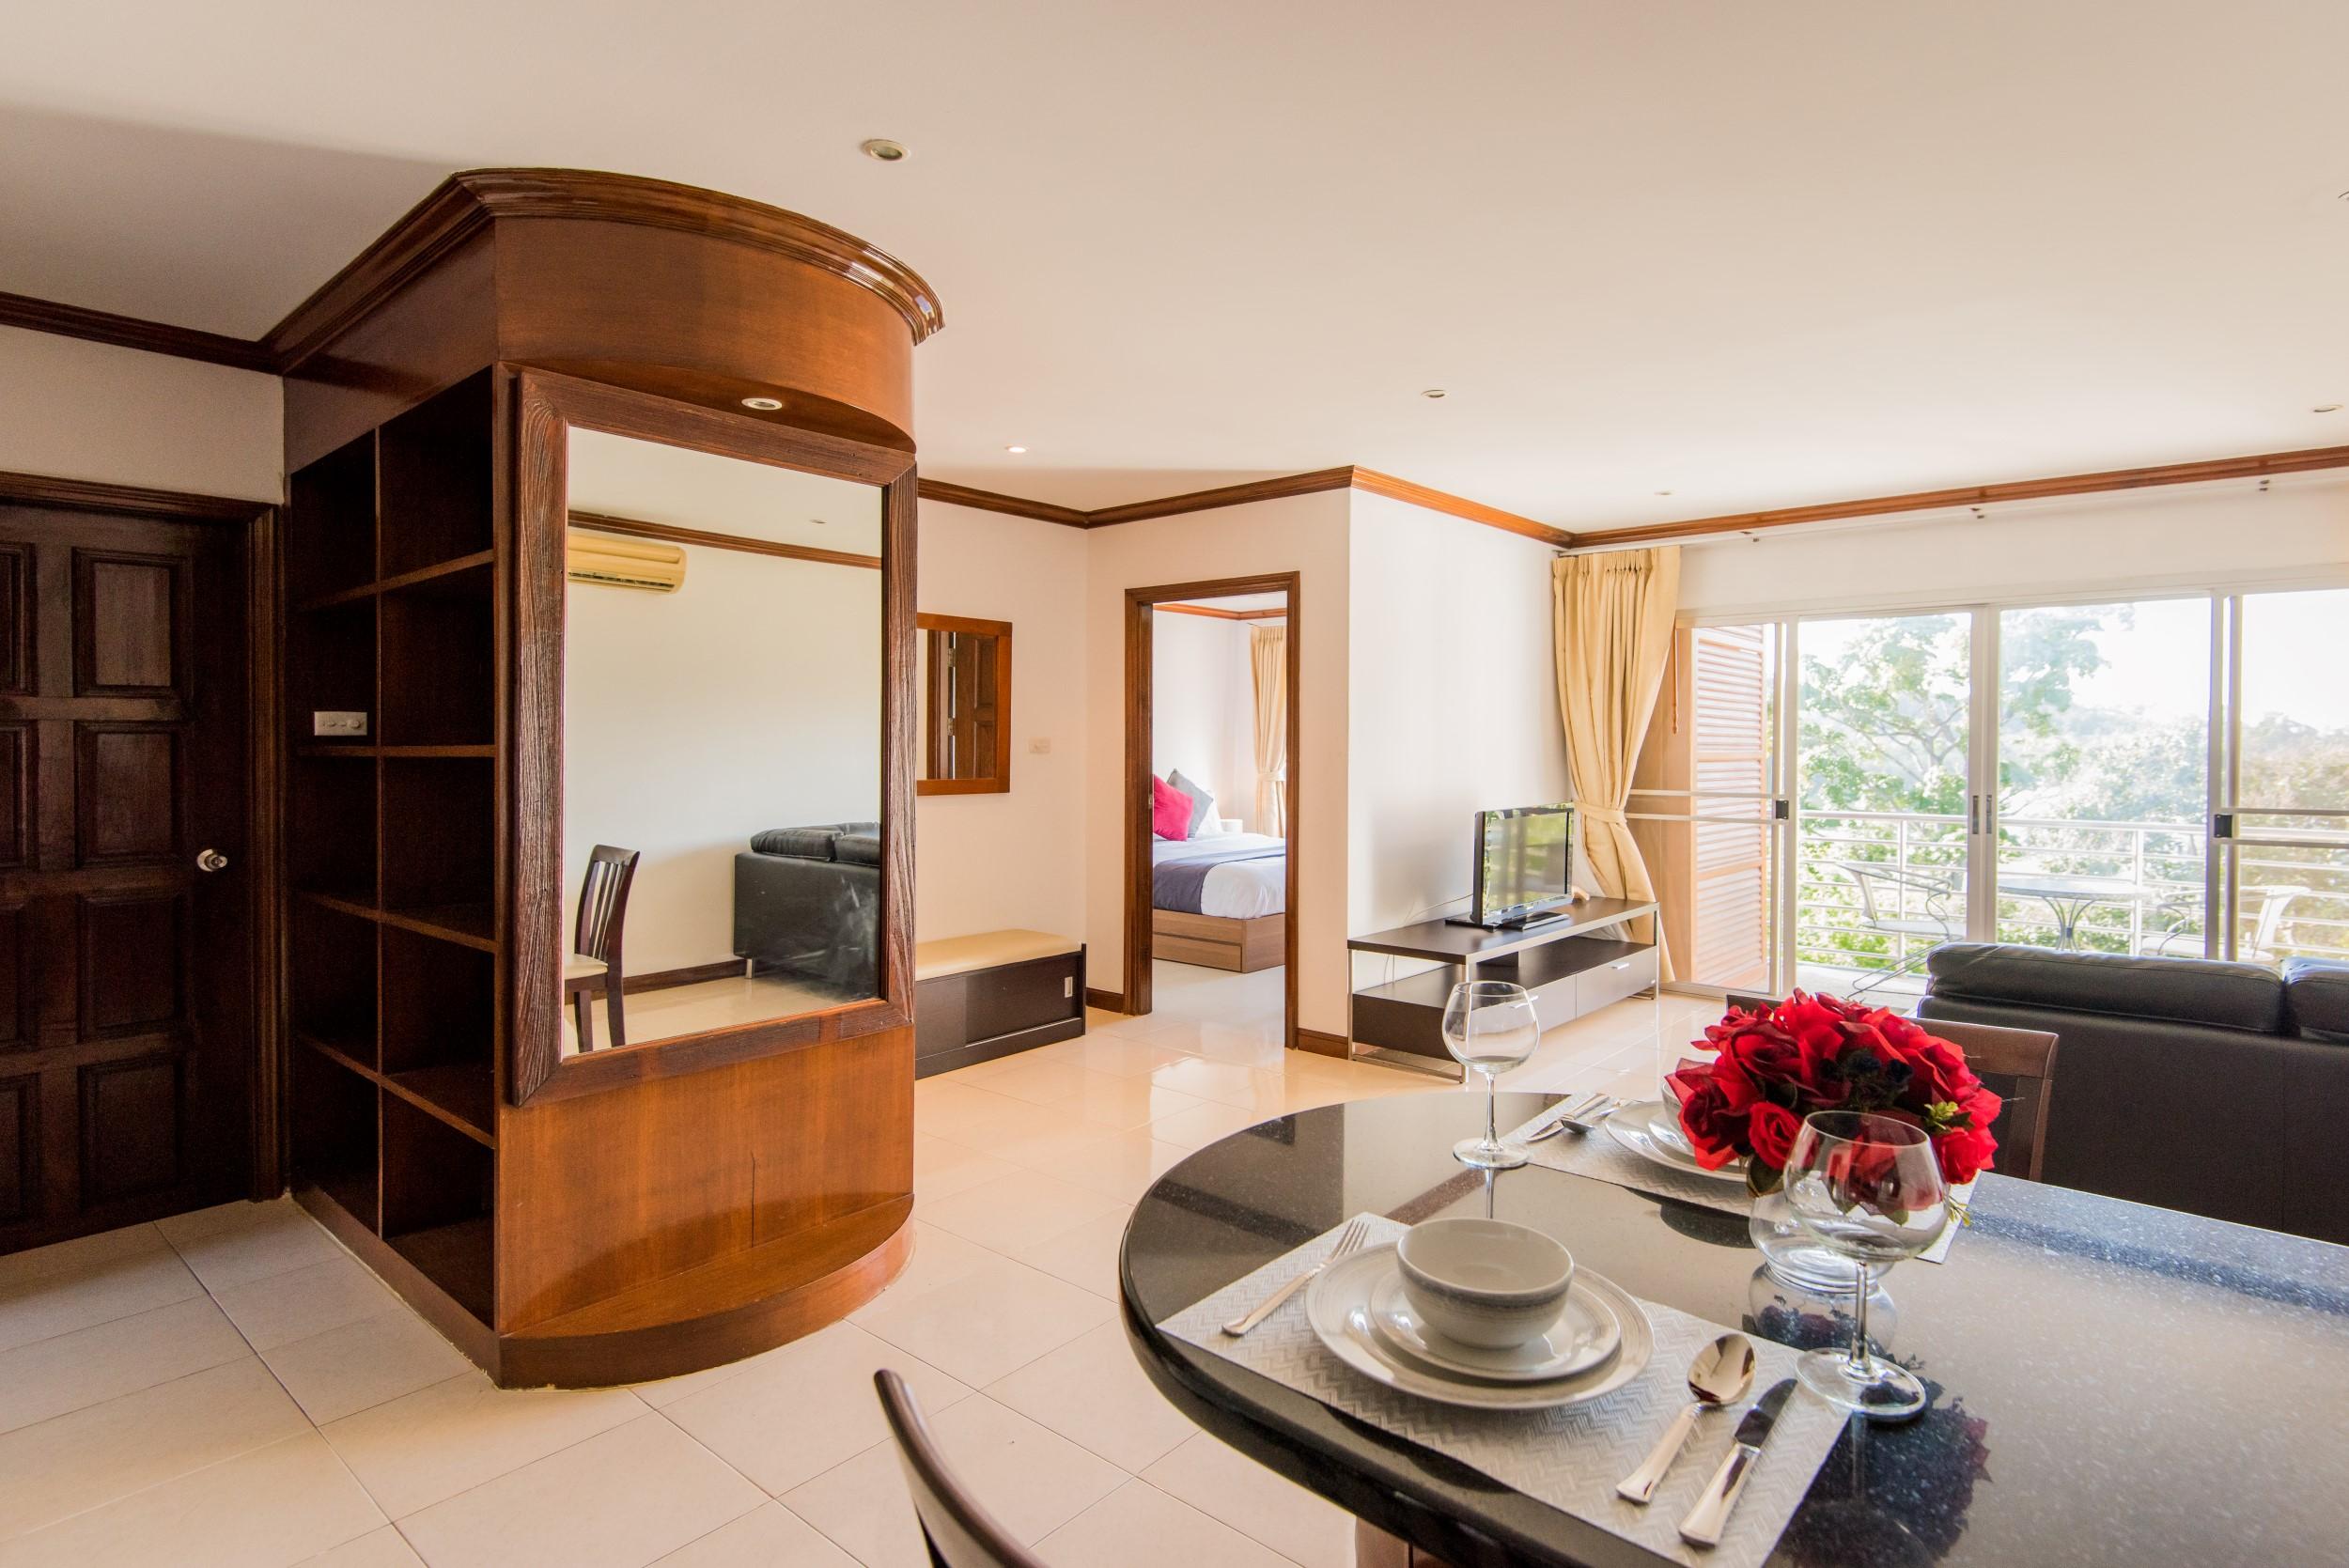 2-Bedroom Condo in Patong Phuket